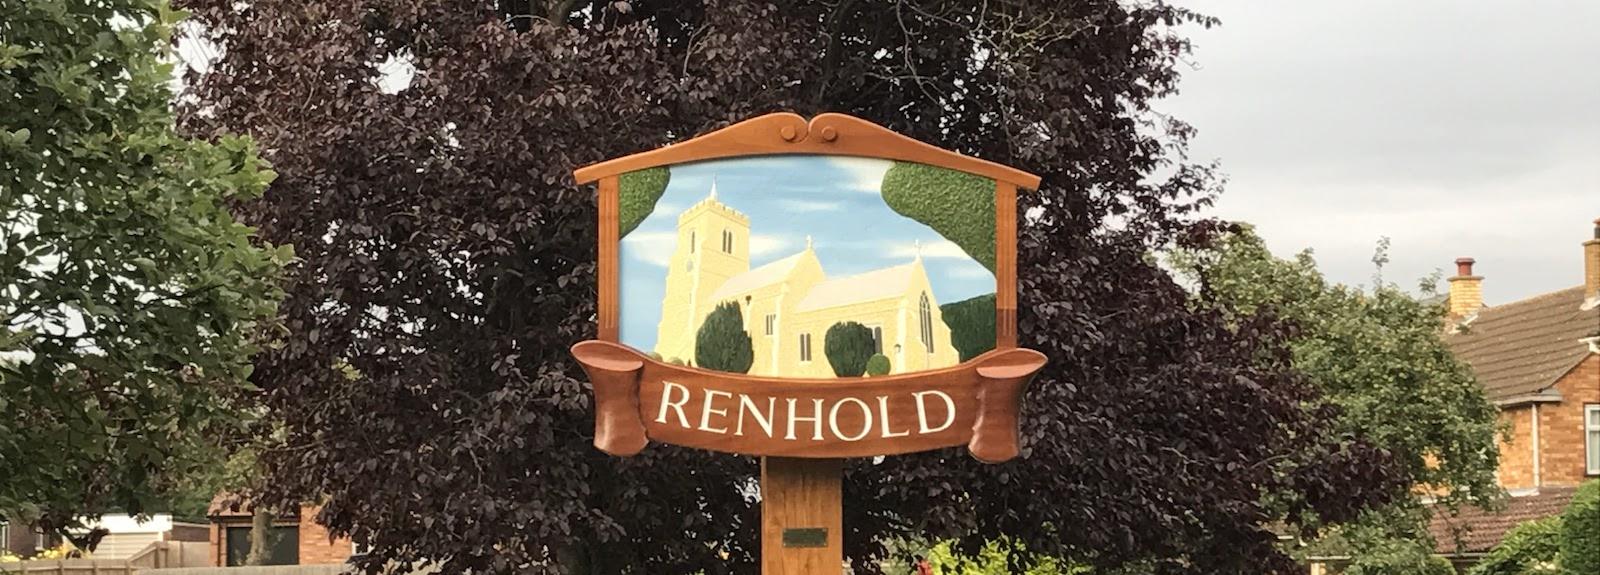 Renhold Village Website - All Saints Church